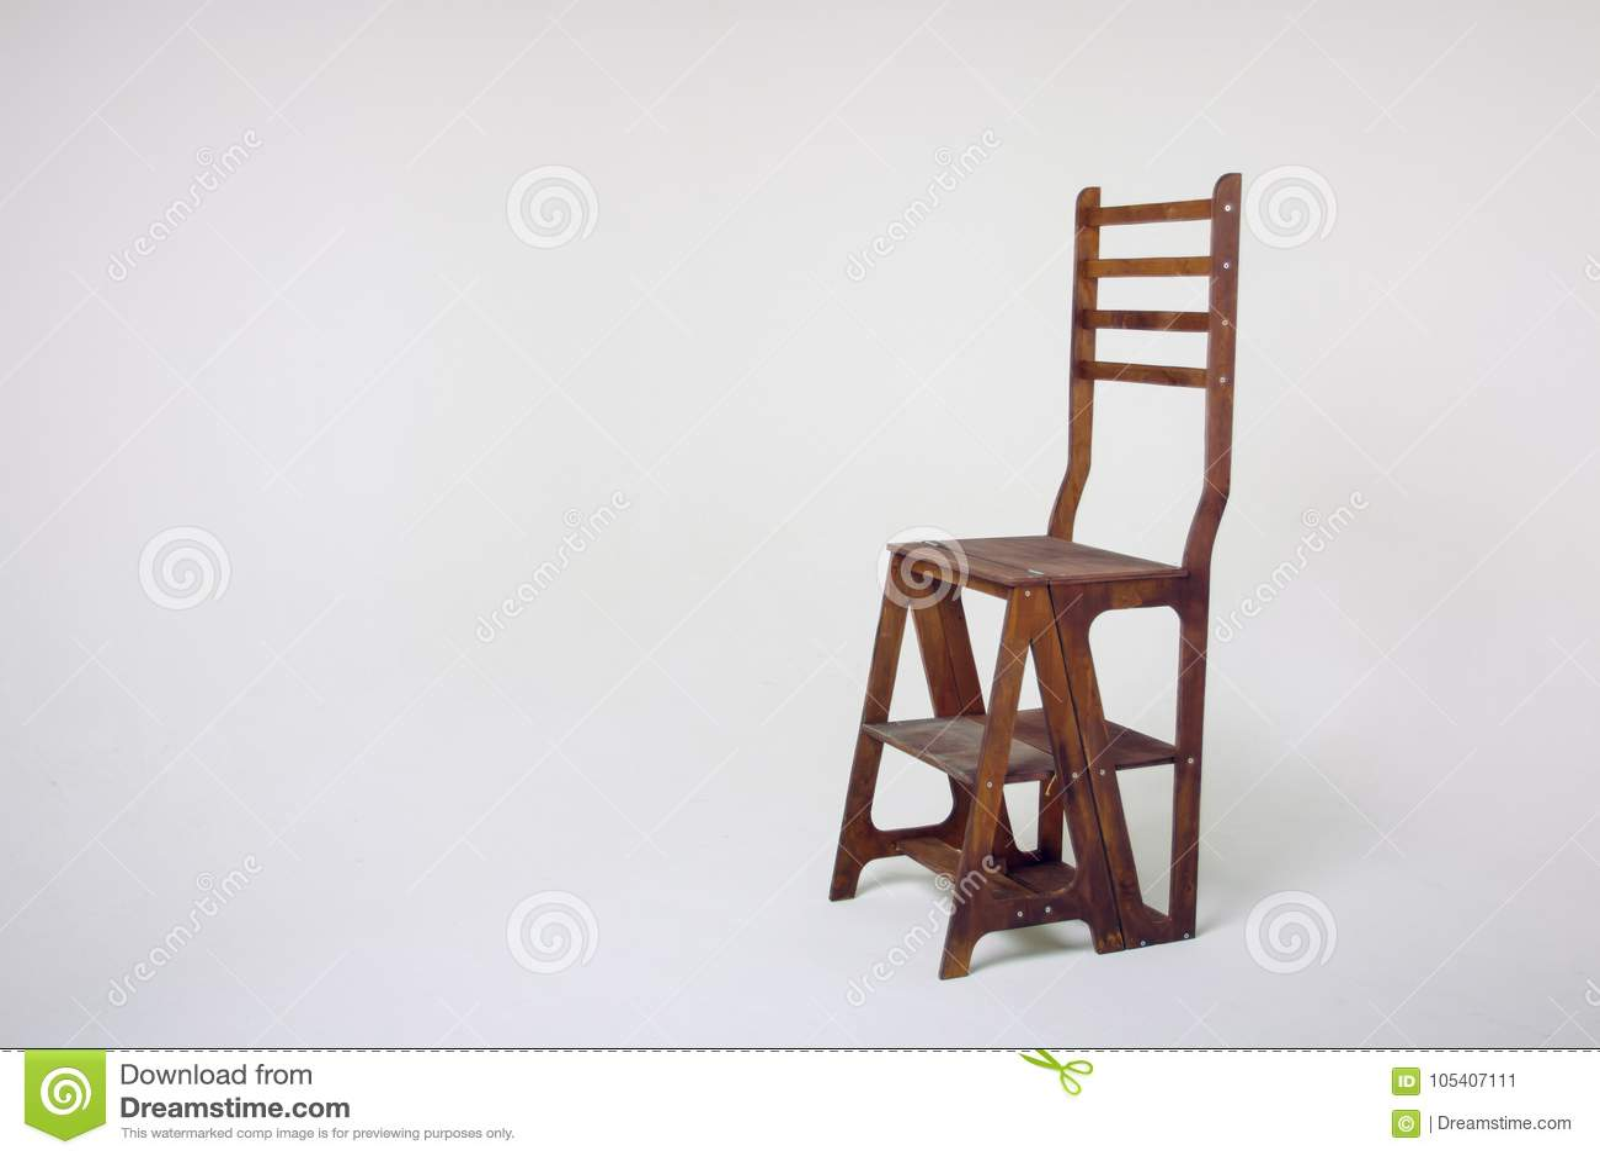 unusual chair legs director covers ebay australia wooden on a white background stock image of an cycramram cycramrame studio light in